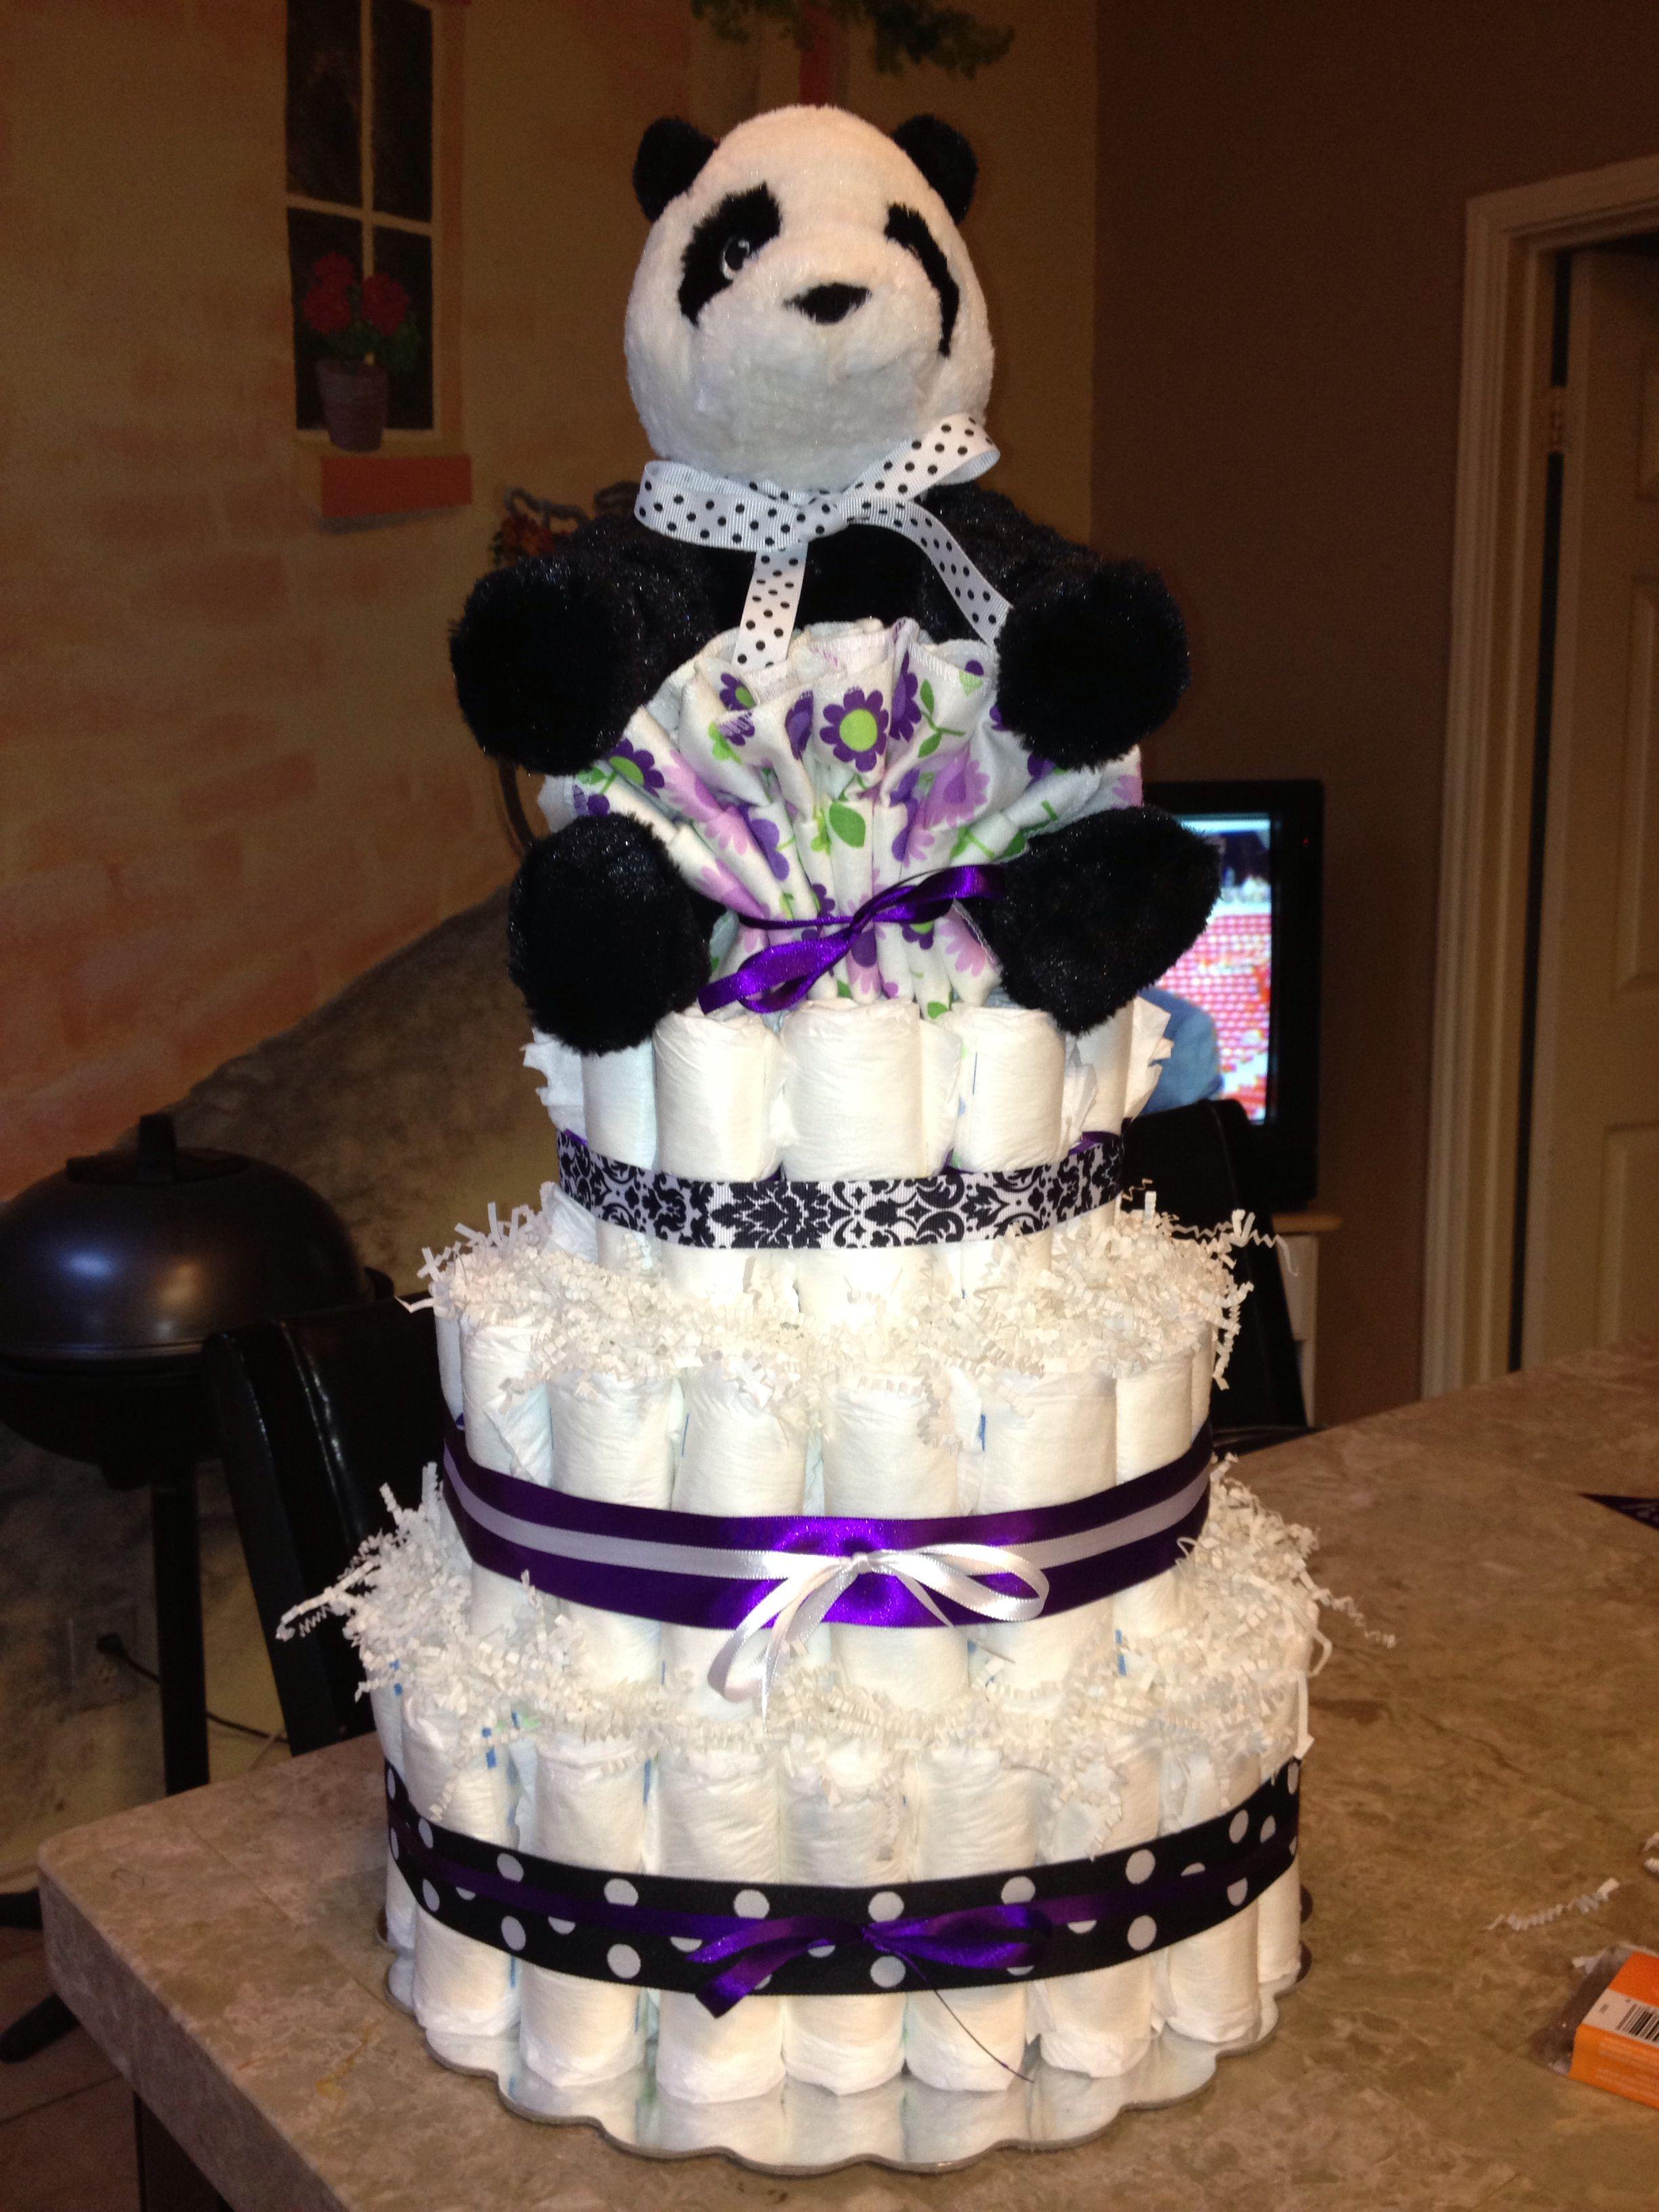 Gmail panda theme - Panda Bear Theme Diaper Cake With Purple Accents